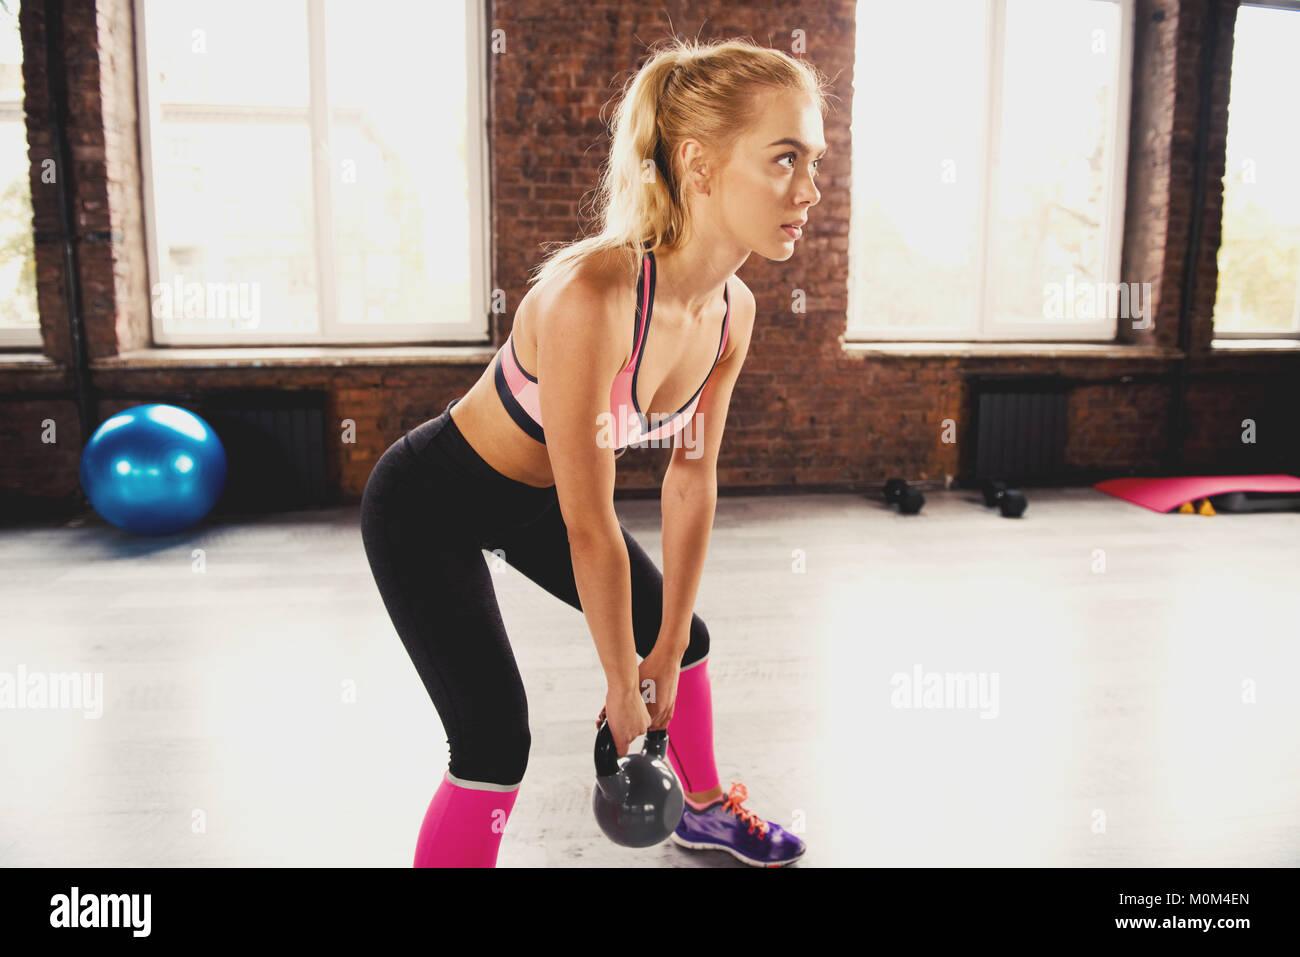 Jeune fille blonde à la salle de sport avec un kettlebell exercice crossfit. Photo Stock